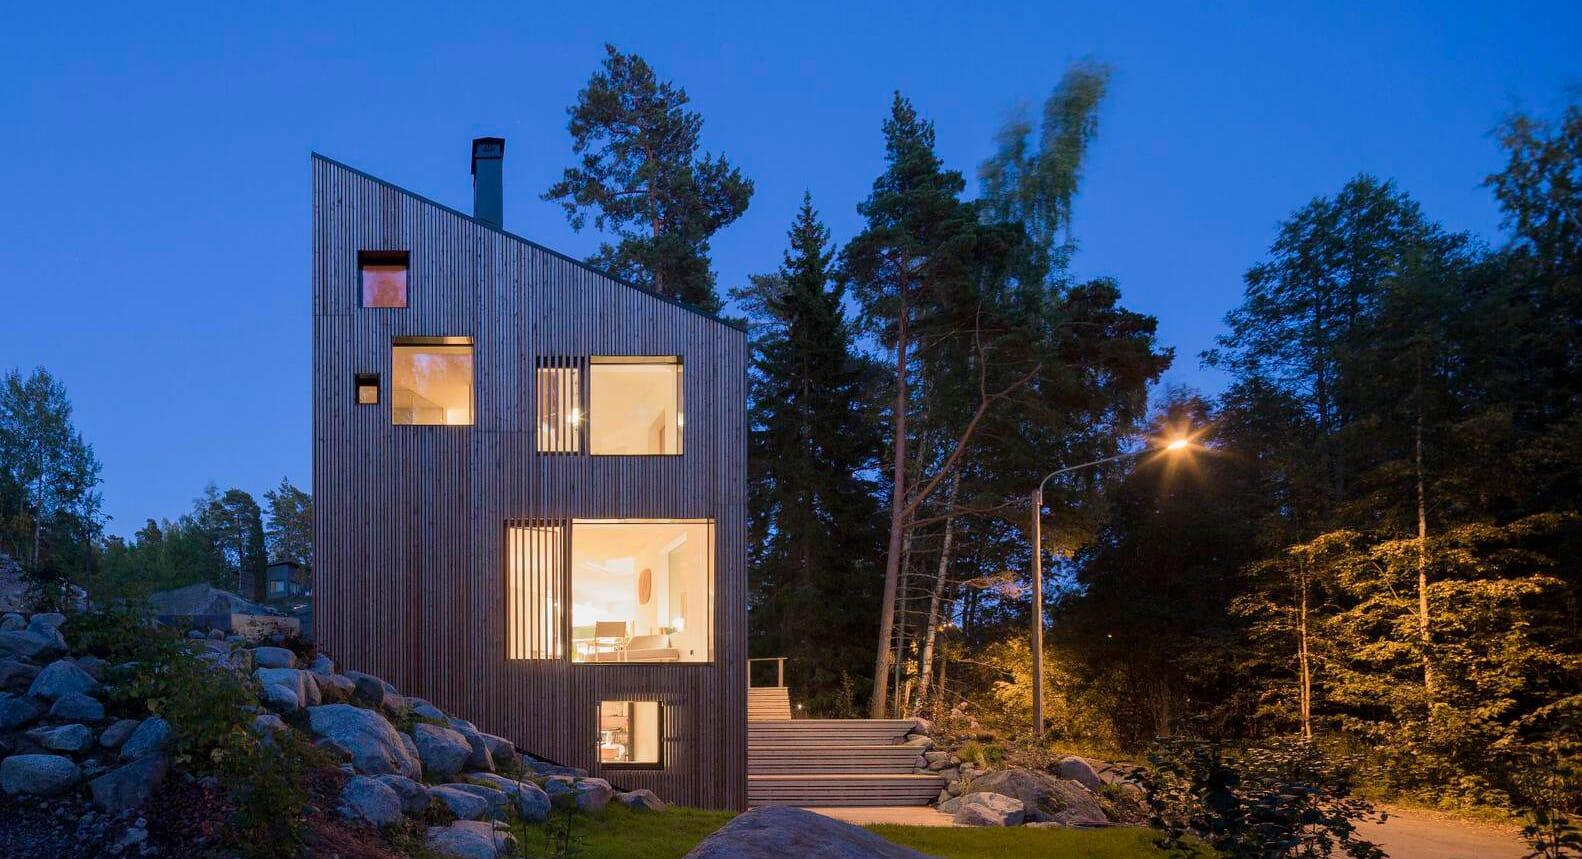 MK5 House Features An Indoor Trapeze, Climbing Wall & Hammock